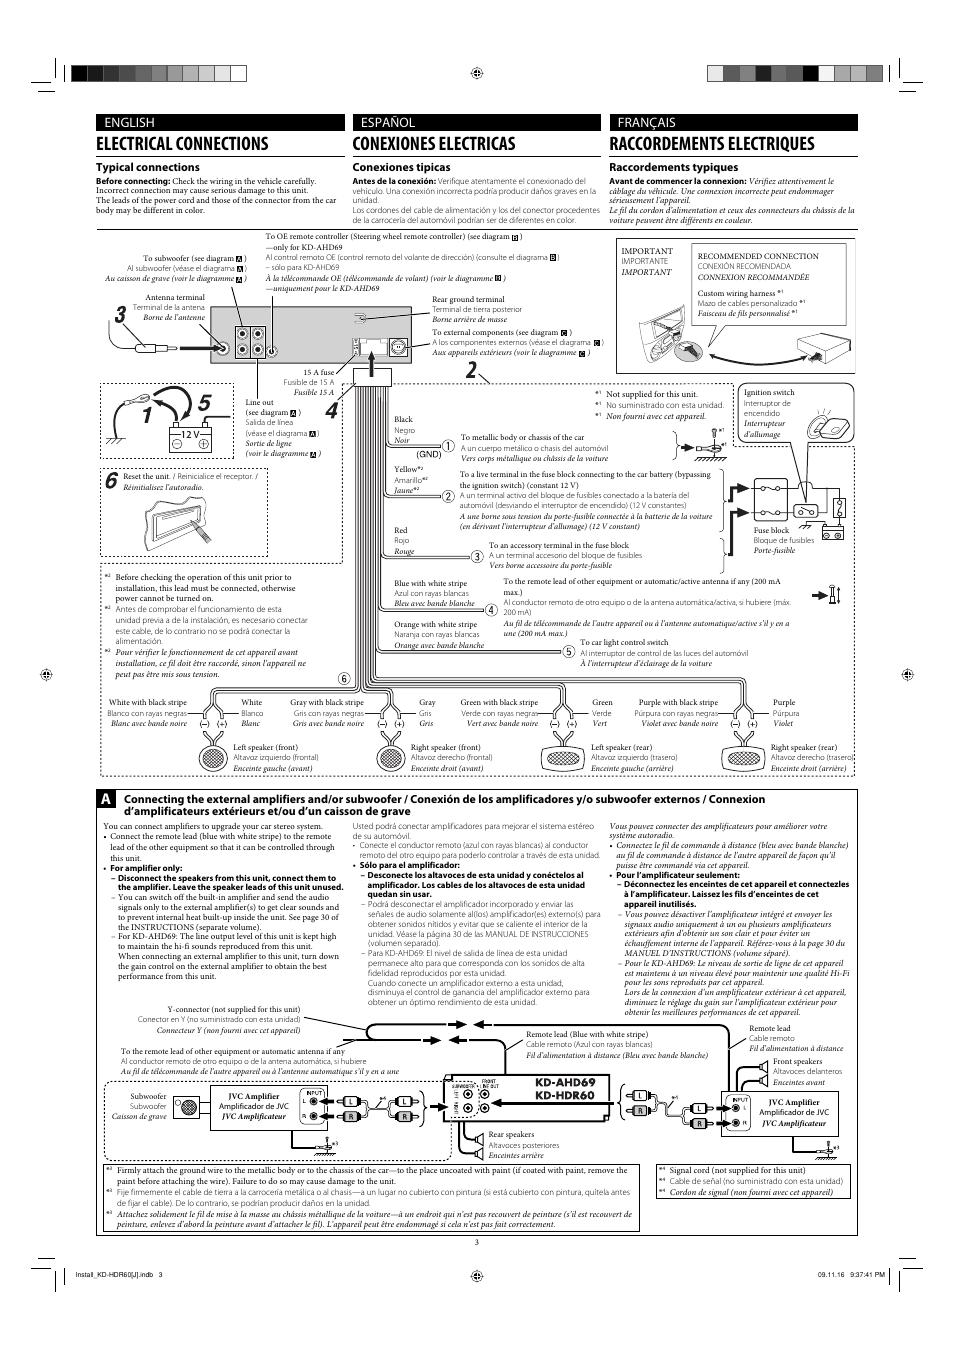 jvc kd ahd69 page3?resize\\=665%2C941 diagrams 683769 jvc kw av60bt wiring diagram 00 civic need help jvc kw-nt3hdt wiring diagram at fashall.co